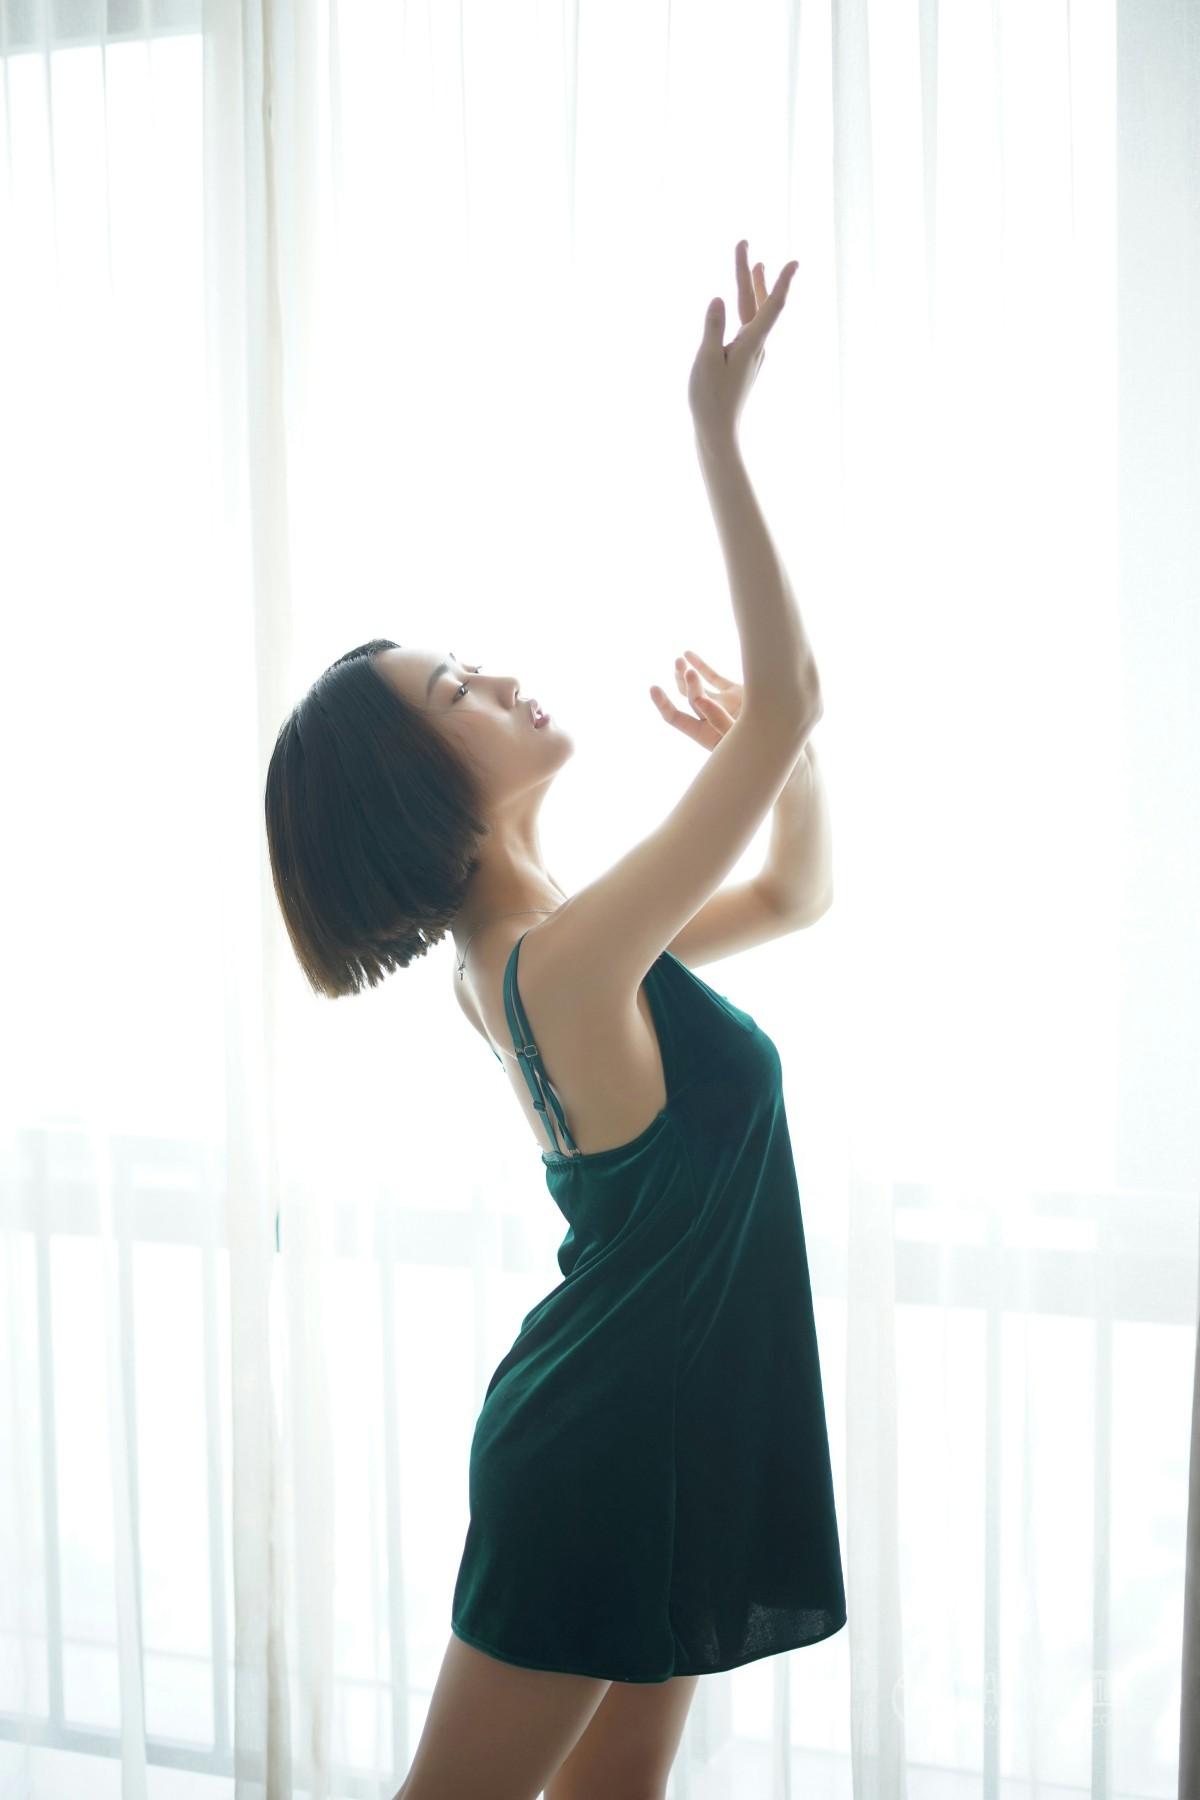 [YALAYI雅拉伊]2018.11.20 No.126 舞寂 肖萧 [42P] 雅拉伊 第2张